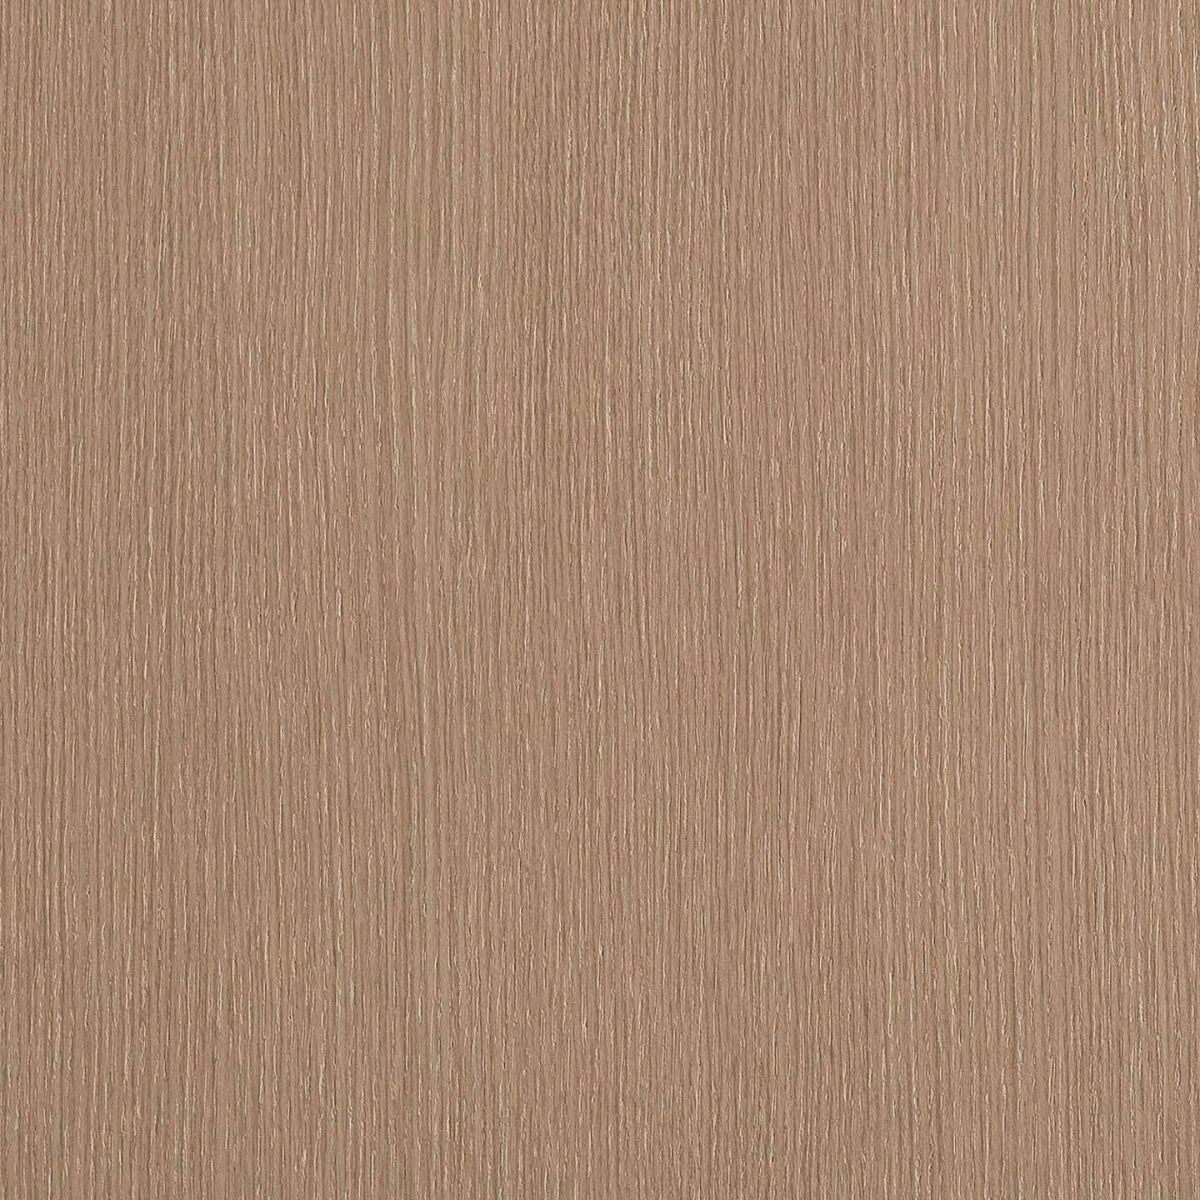 Finish oak pore panels for glass wall